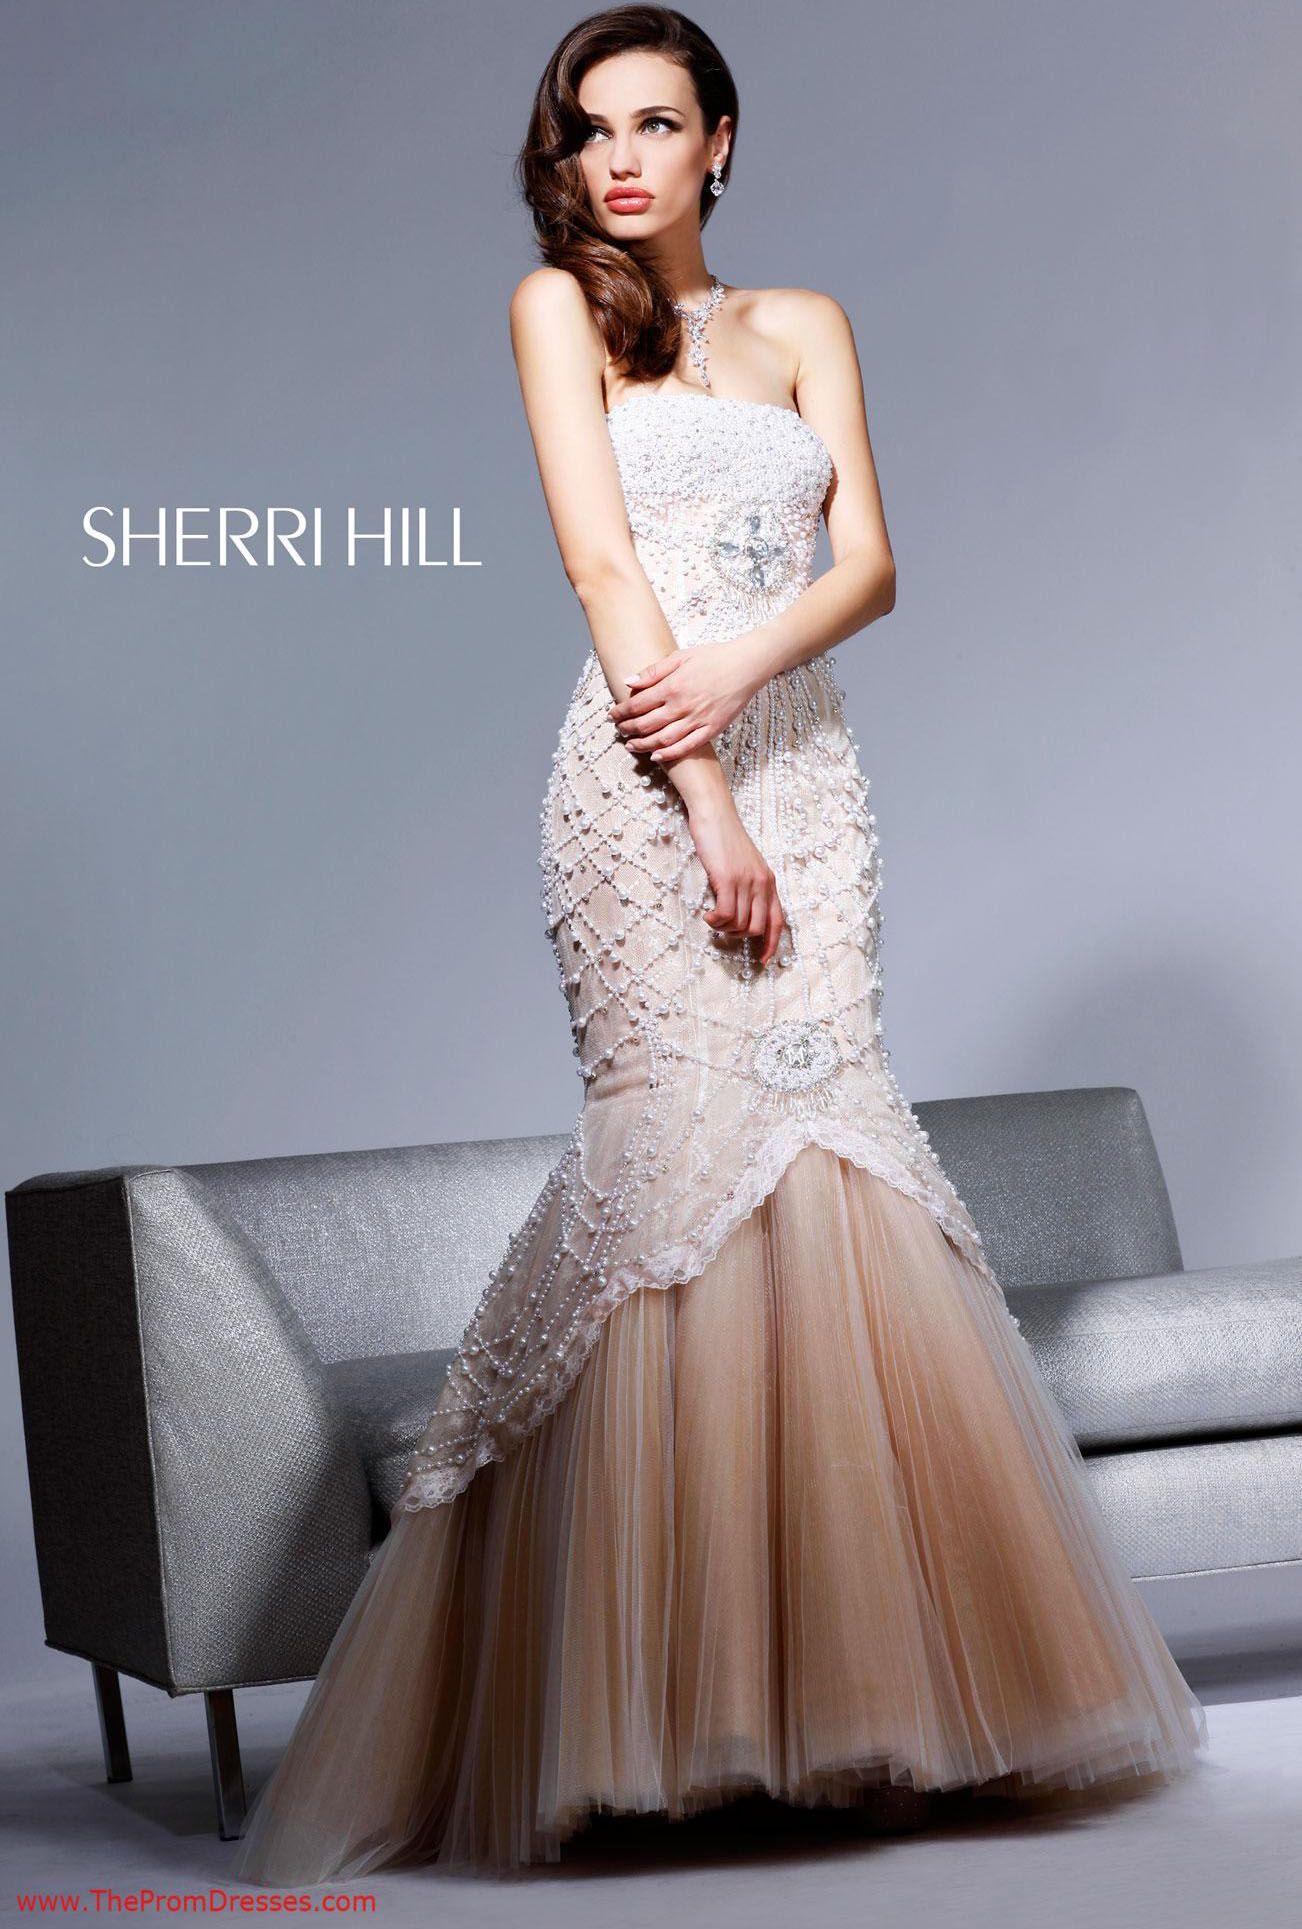 Sherri hill art deco us great gatsby wedding dress